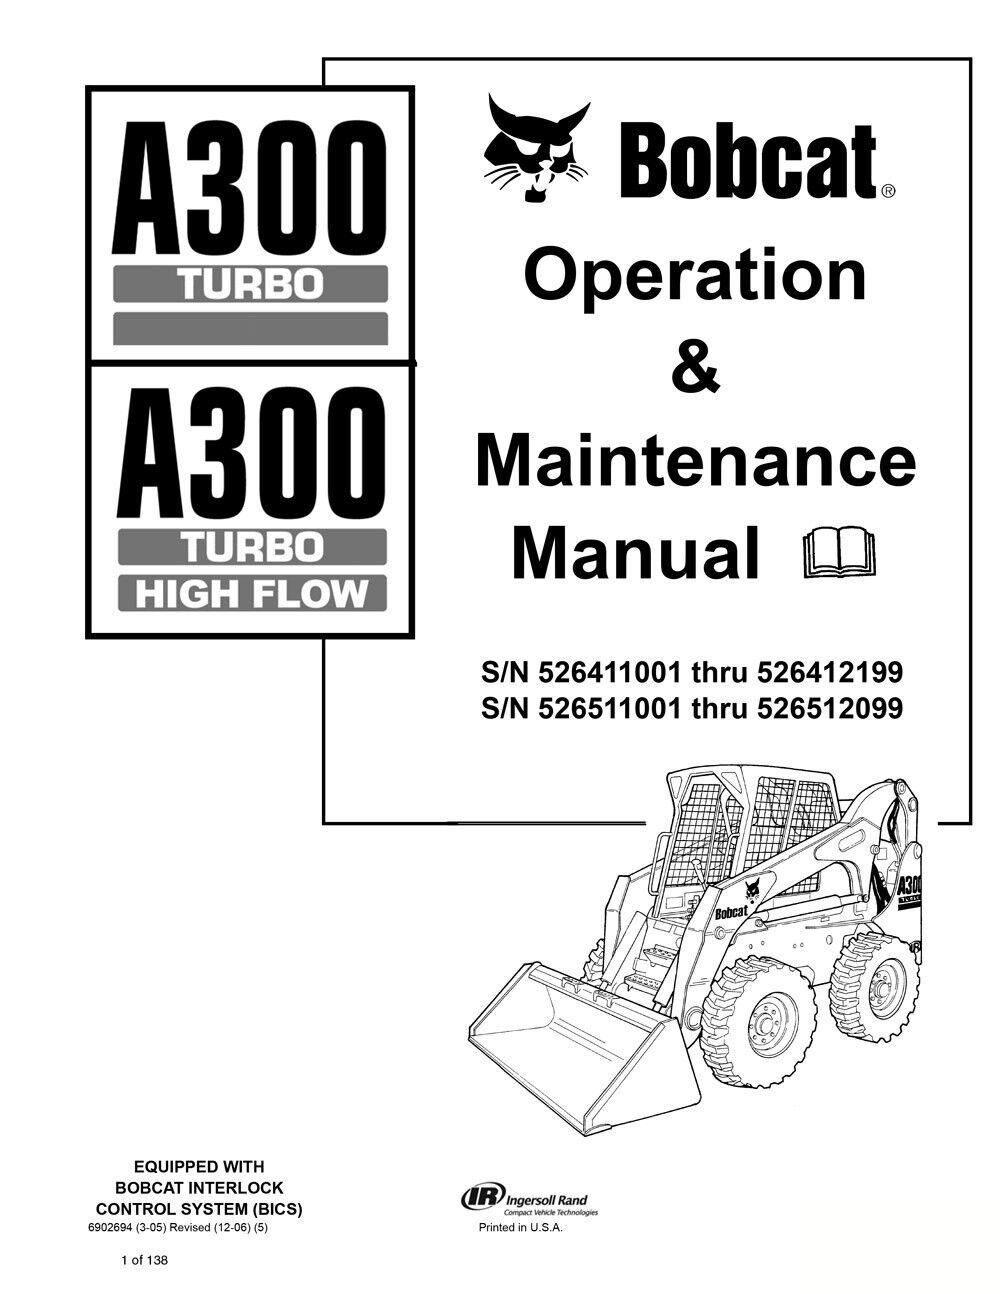 New Bobcat A300 Turbo & Turbo Highflow Operation